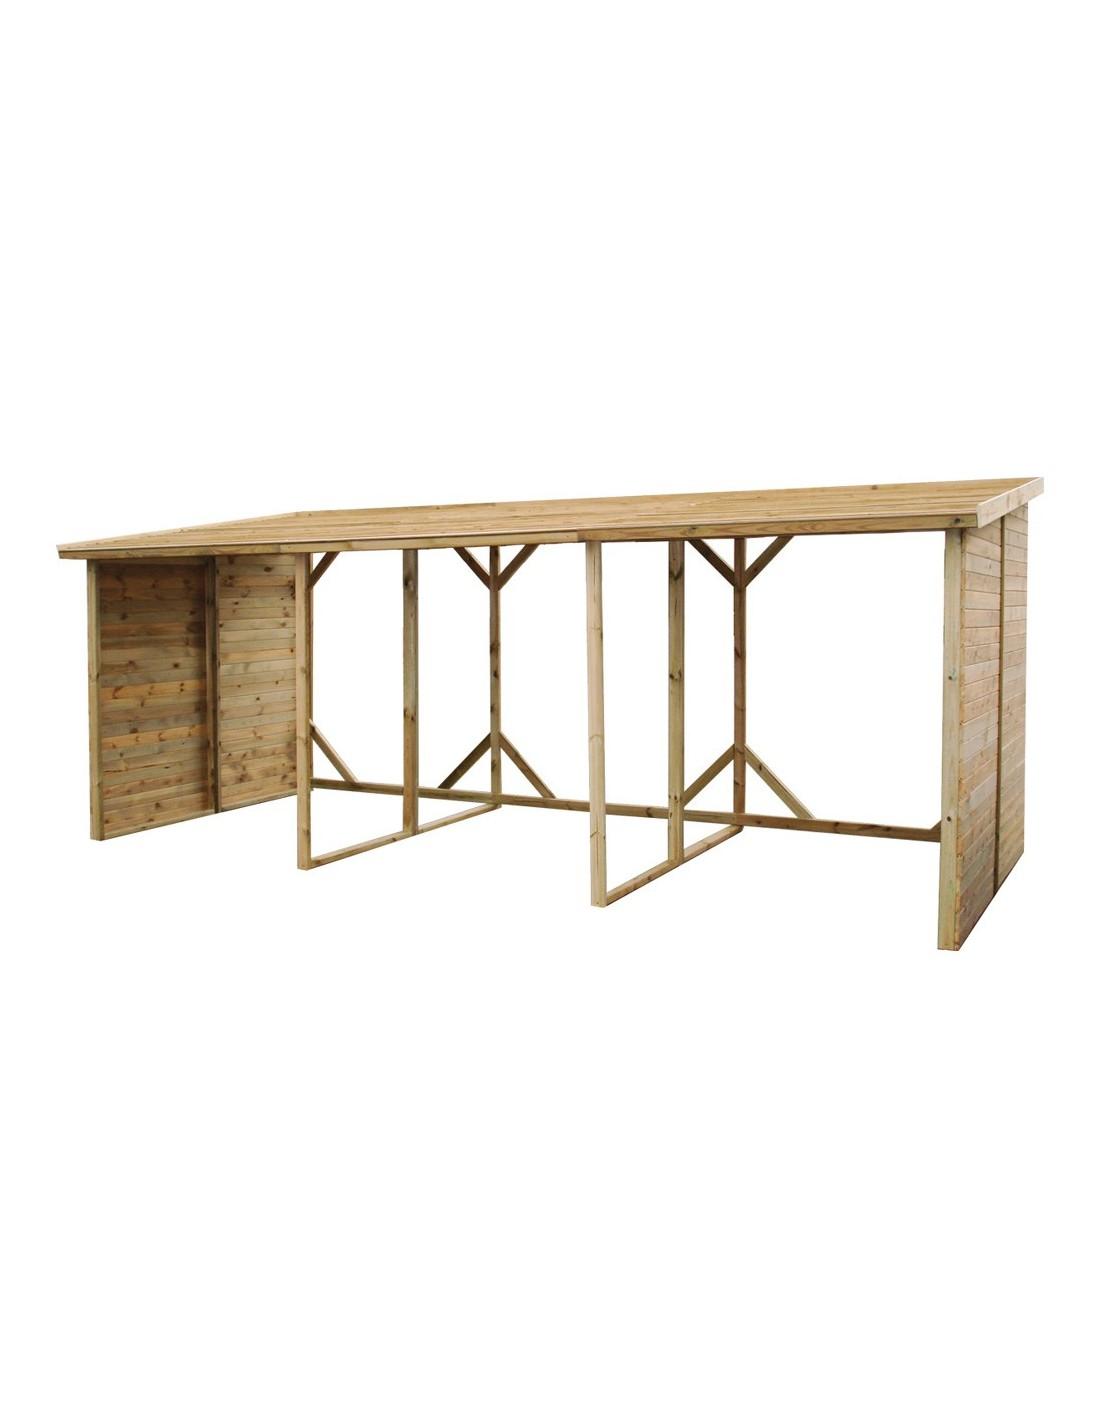 abri b ches xxl jardipolys capacit 20 st res. Black Bedroom Furniture Sets. Home Design Ideas